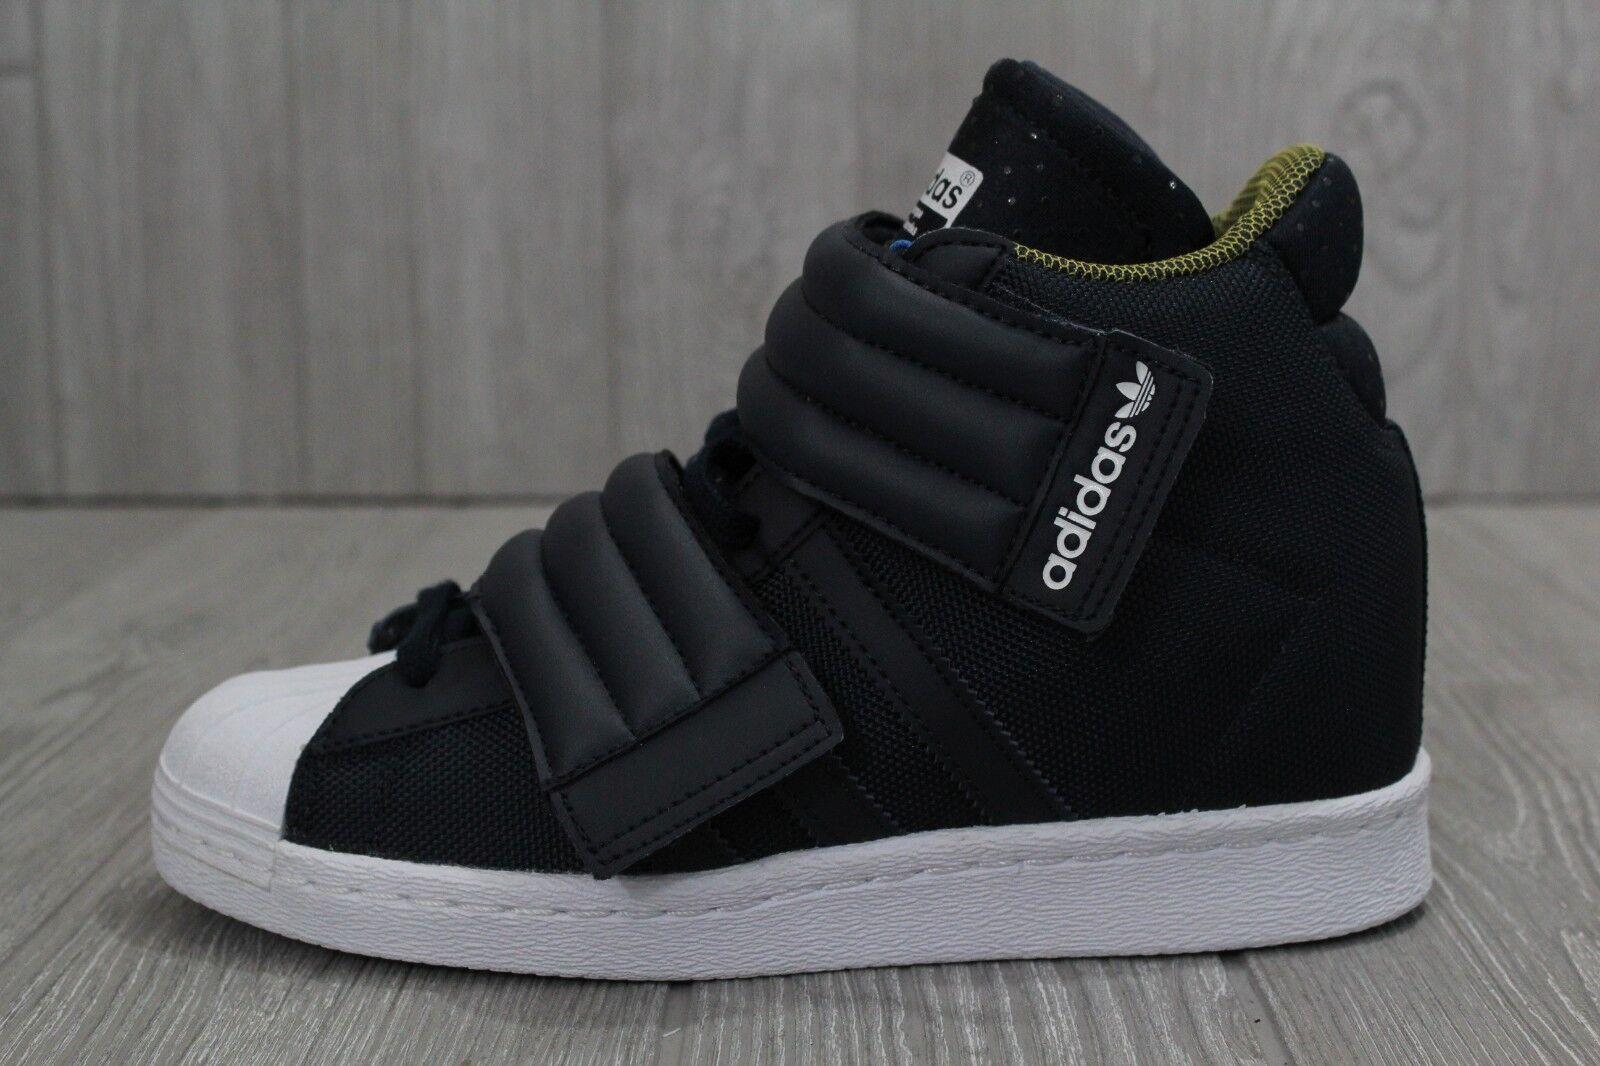 adidas Originals Superstar Up 2 strap W